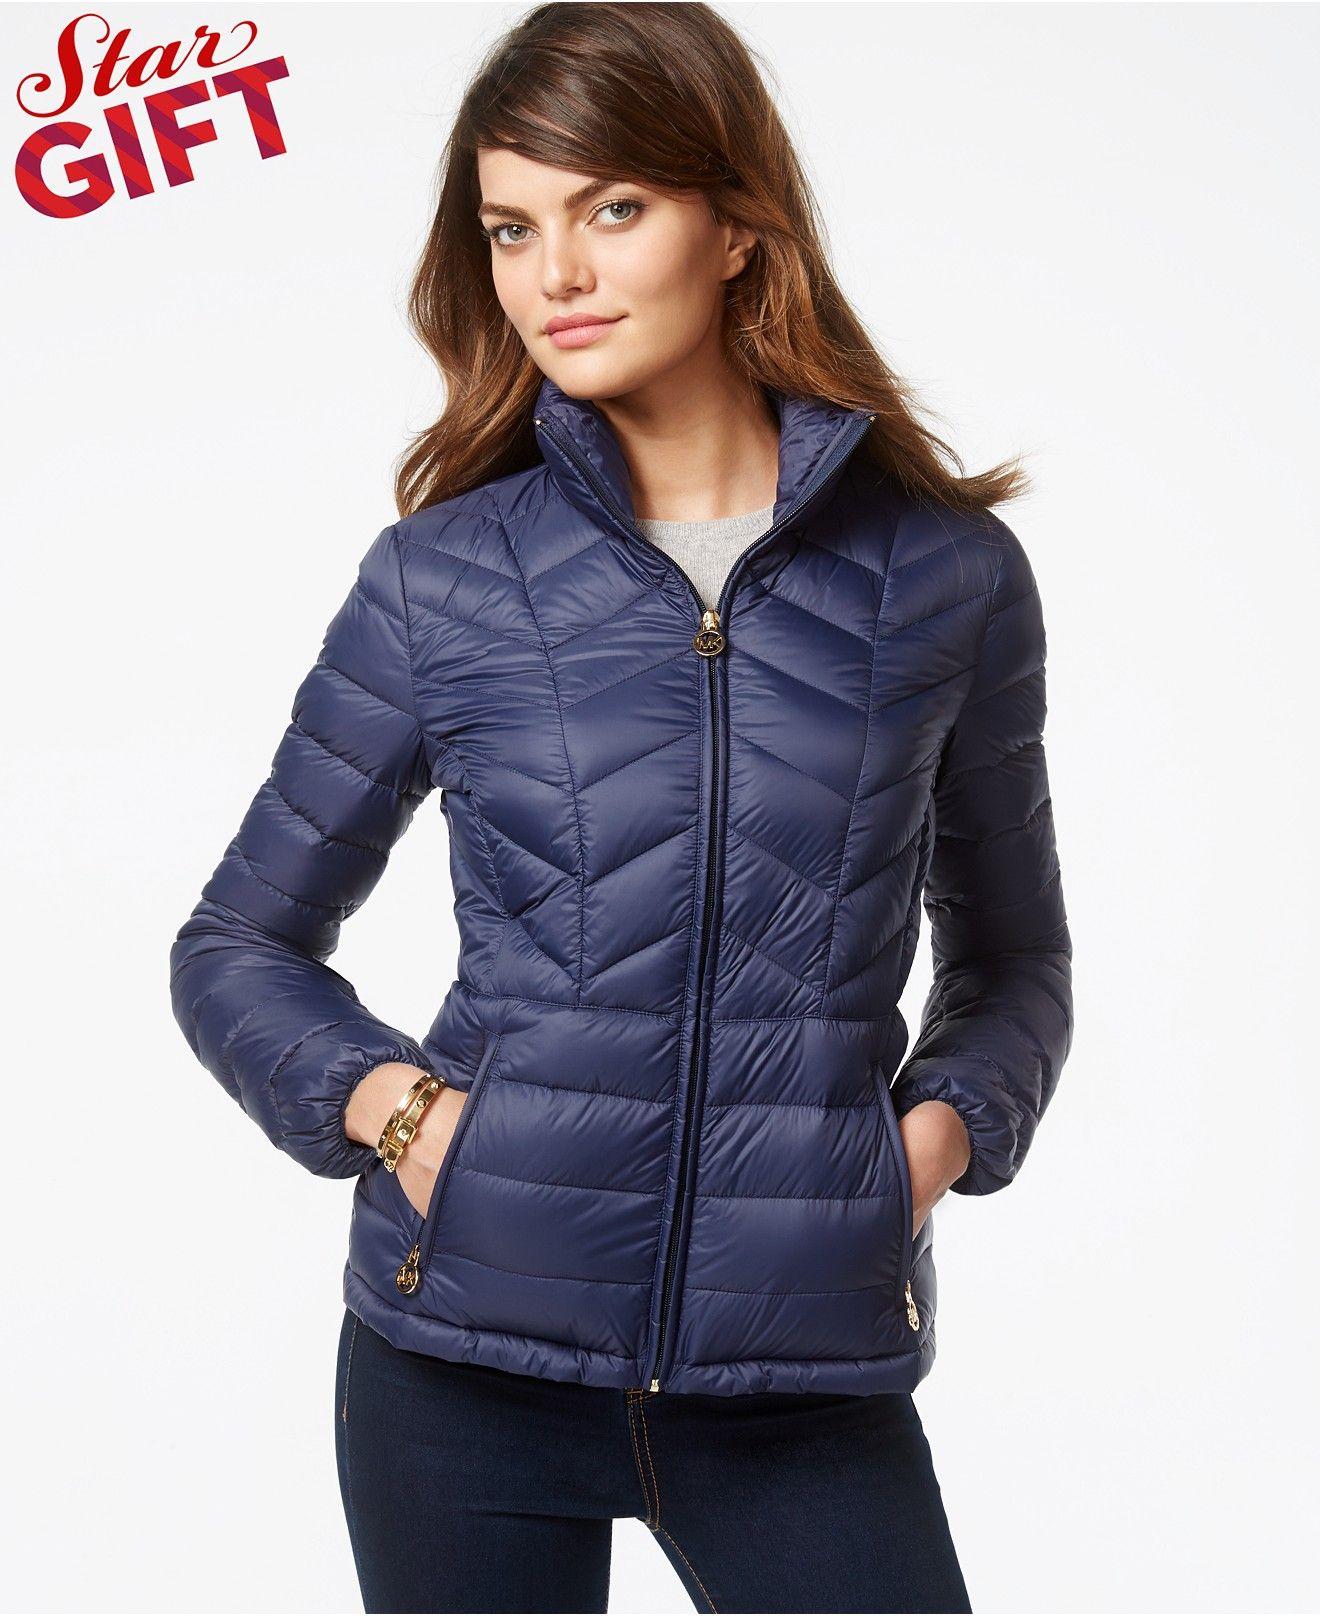 MICHAEL Michael Kors Chevron-Quilted Packable Down Jacket - Coats ...